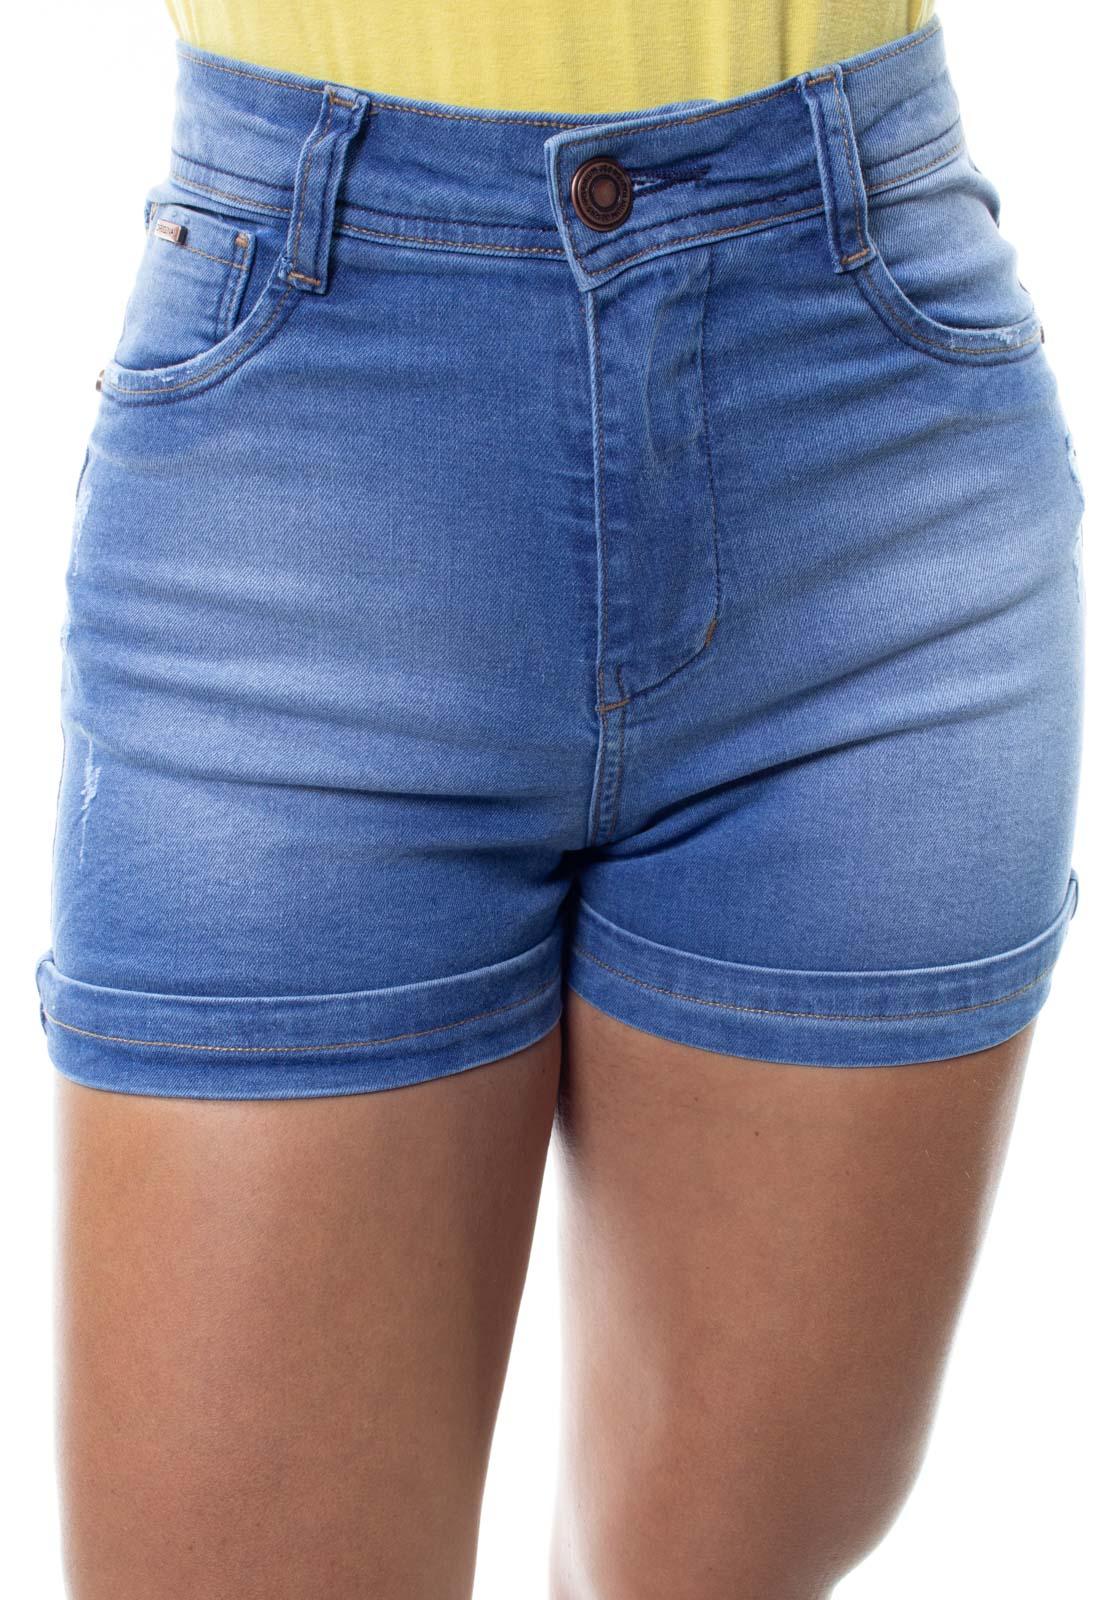 Shorts Jeans Feminino Curto  Barra Dobrada Crocker - 48296  - CROCKER JEANS